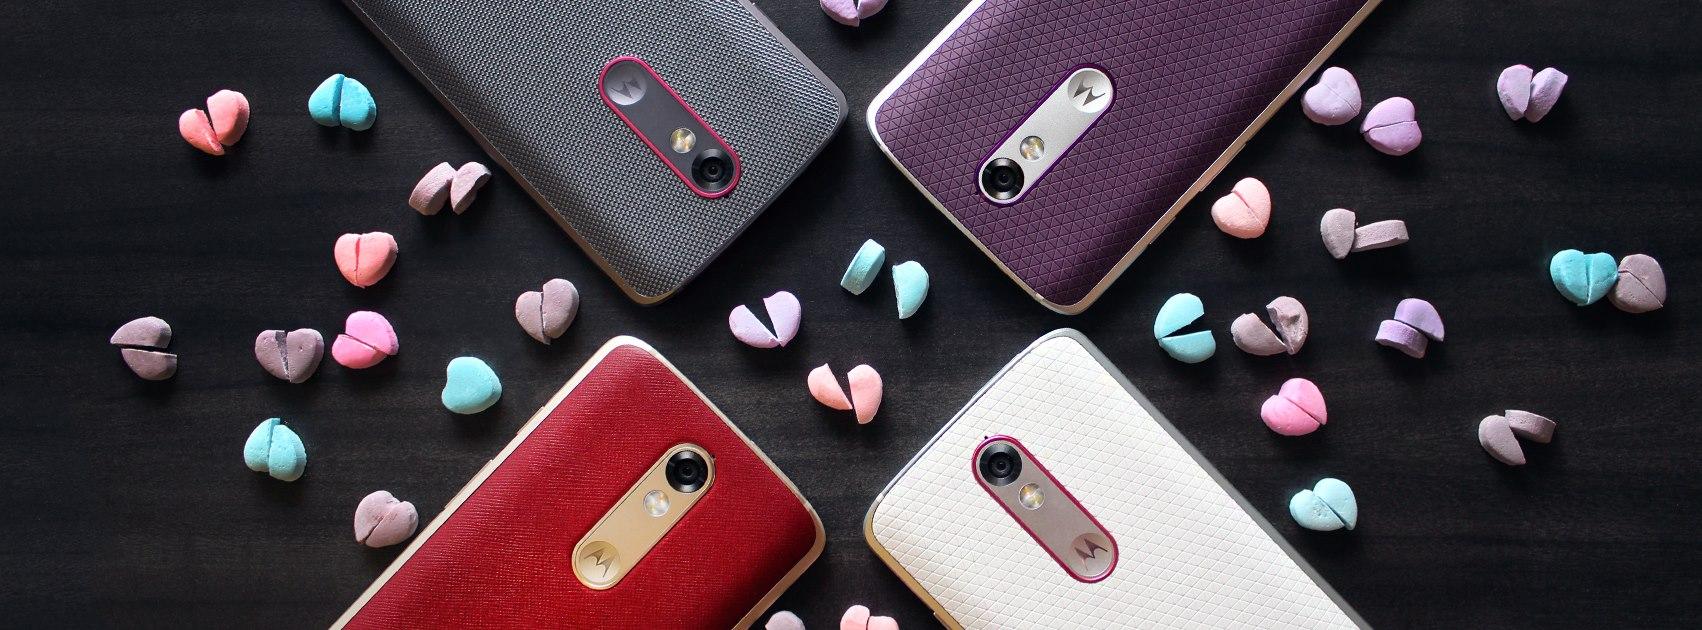 motorola – smartphones pas cher des gammes Moto – Dealabs